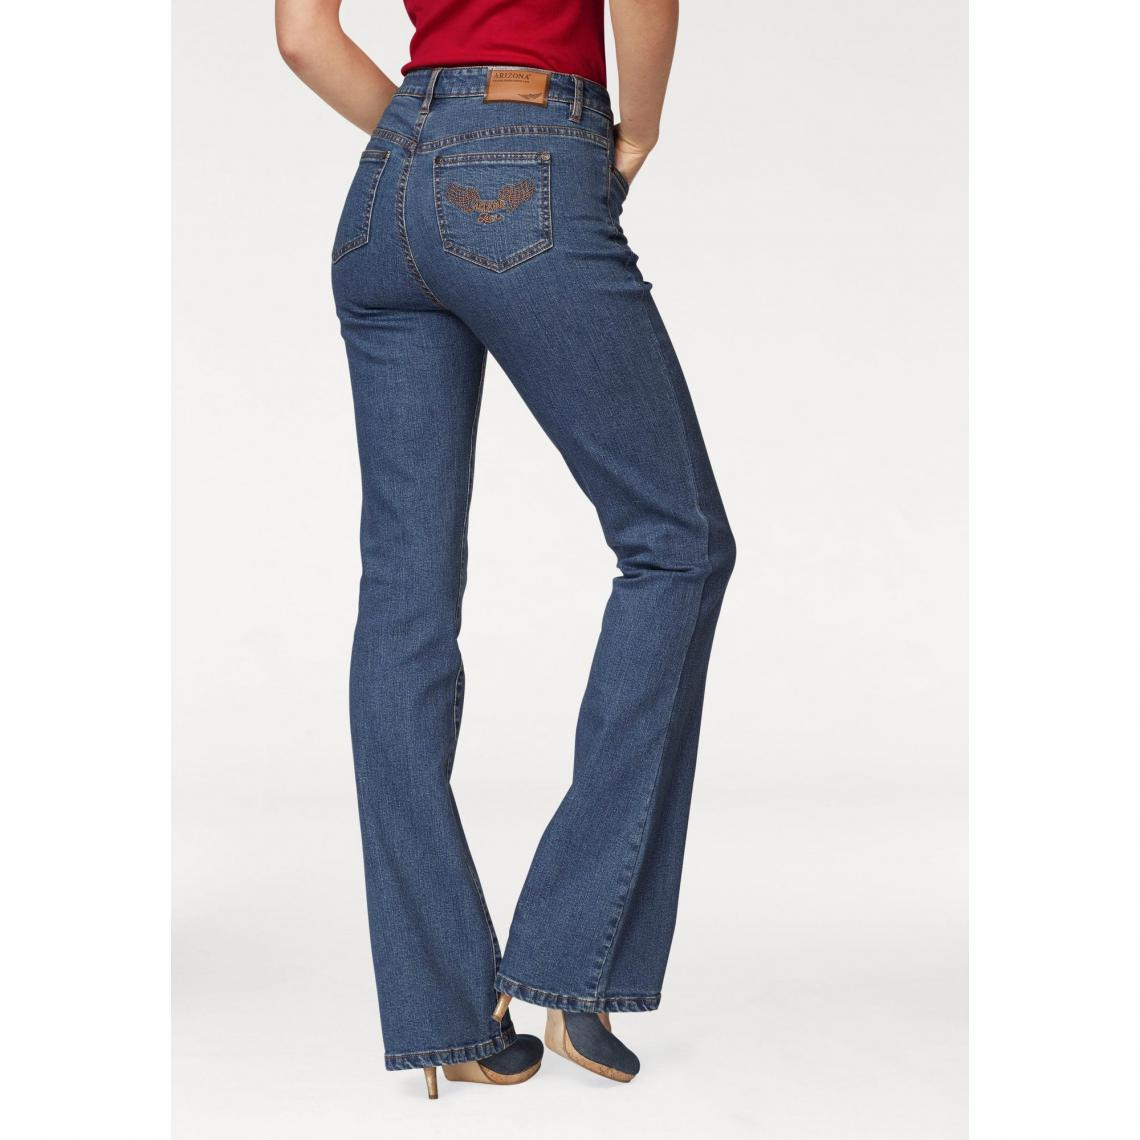 5ed9a672af1f Jean bootcut taille haute extra confort femme Arizona - Bleu Stone ...